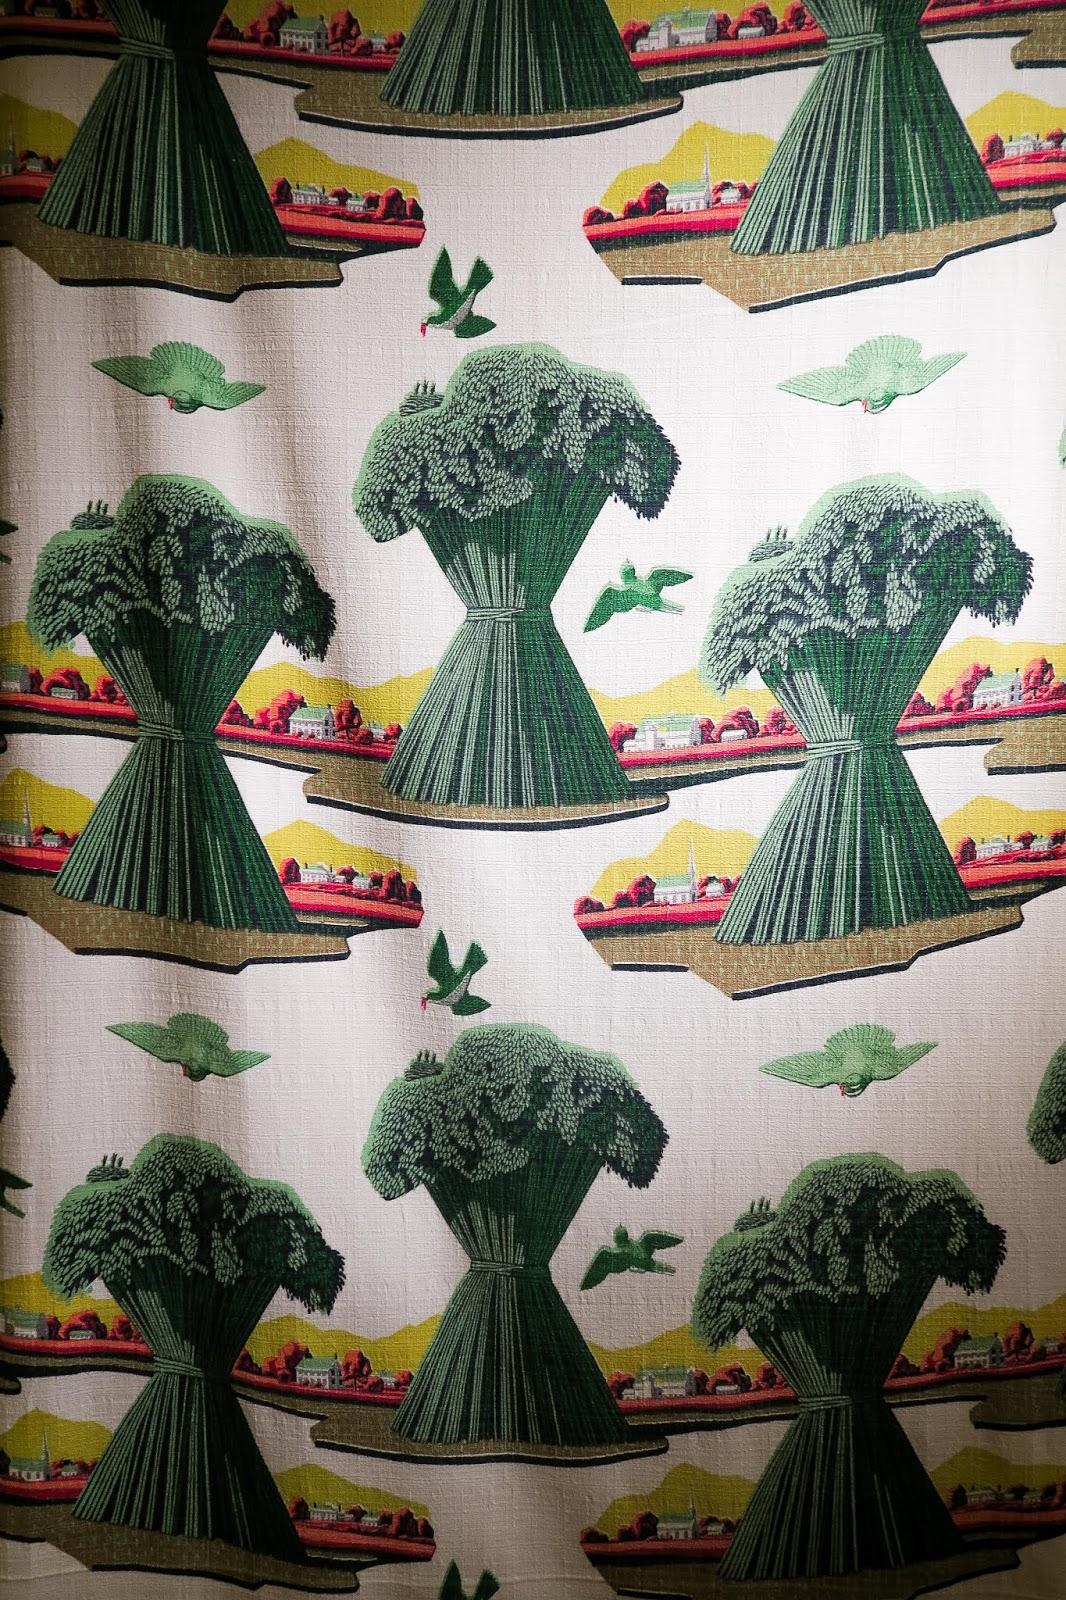 artist textiles picasso to warhol new lanark art liquidgrain liquid grain